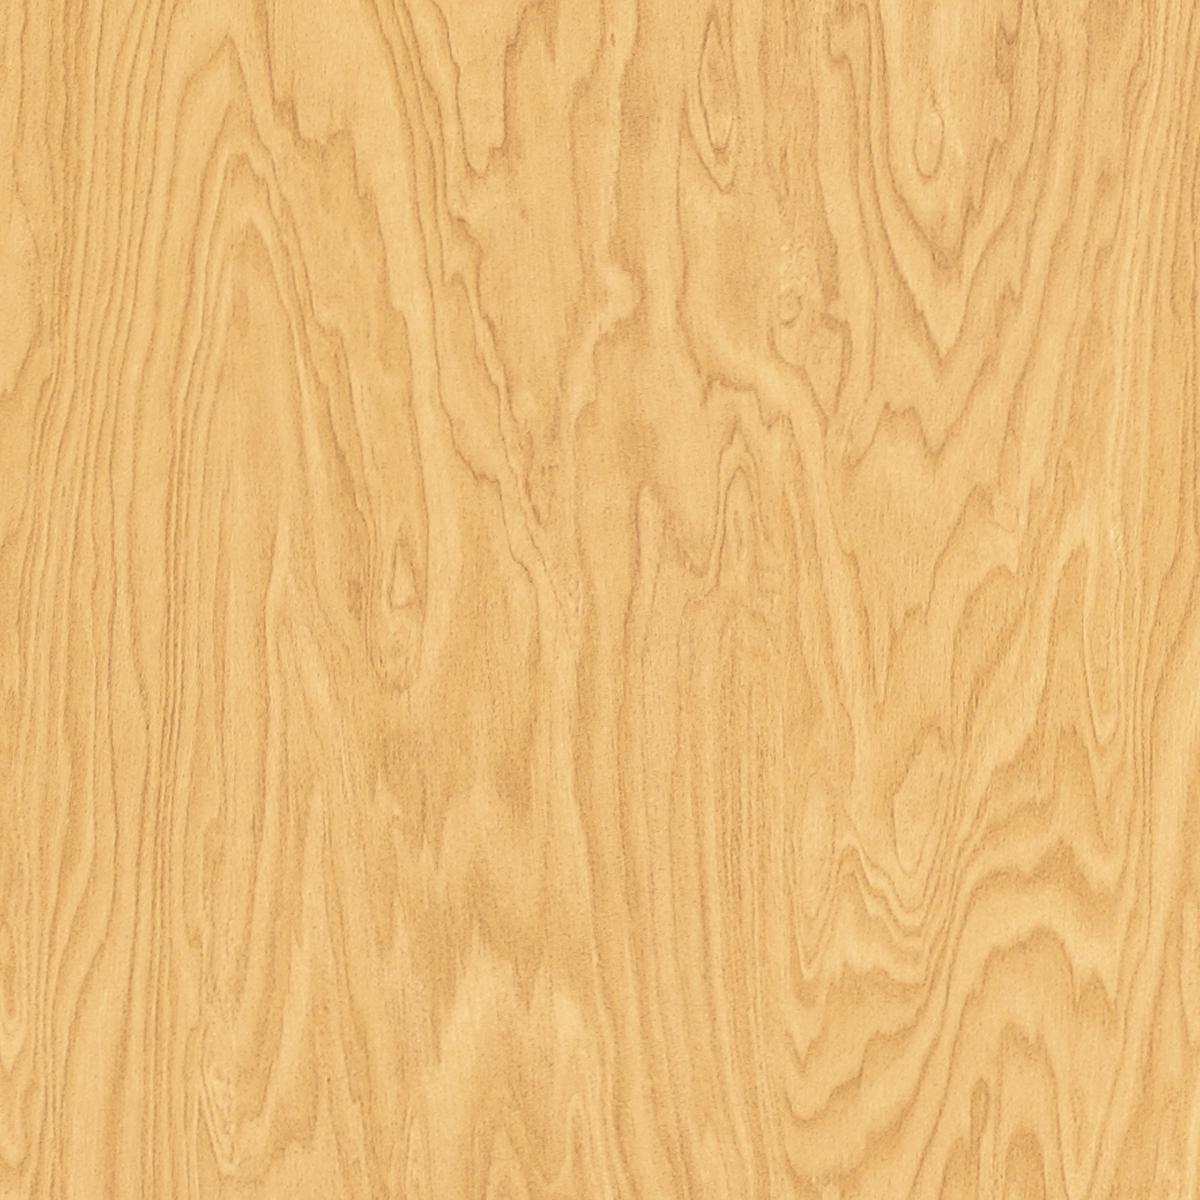 7481 Natural Birch - Formica